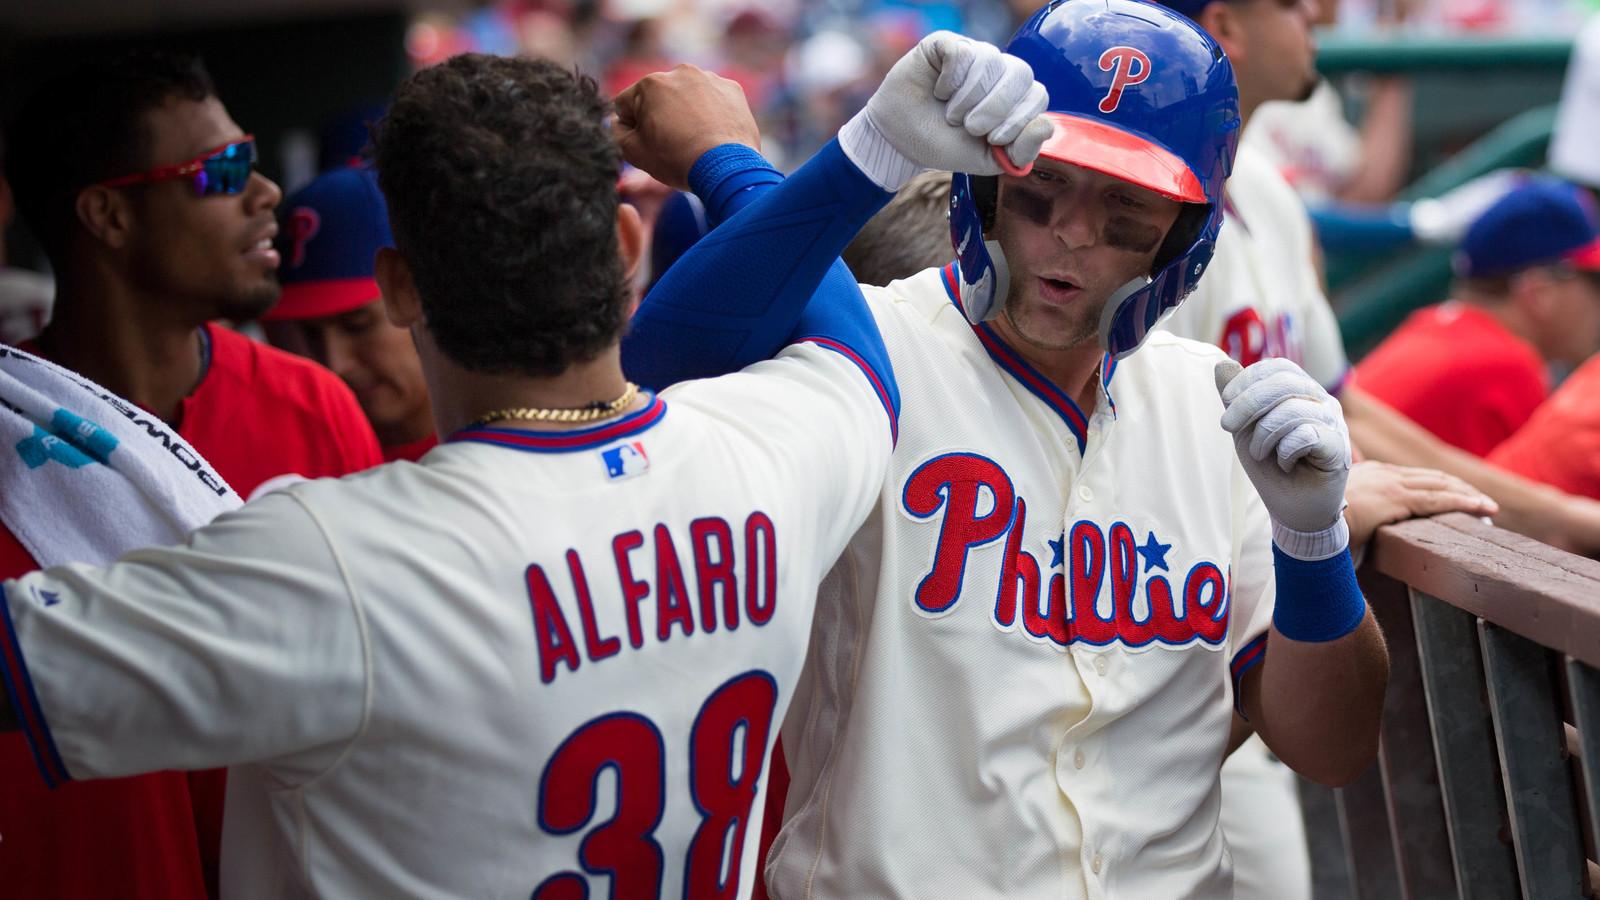 Rhys Hoskins Philadelphia Phillies New Arrivals Legend Baseball Player Jersey